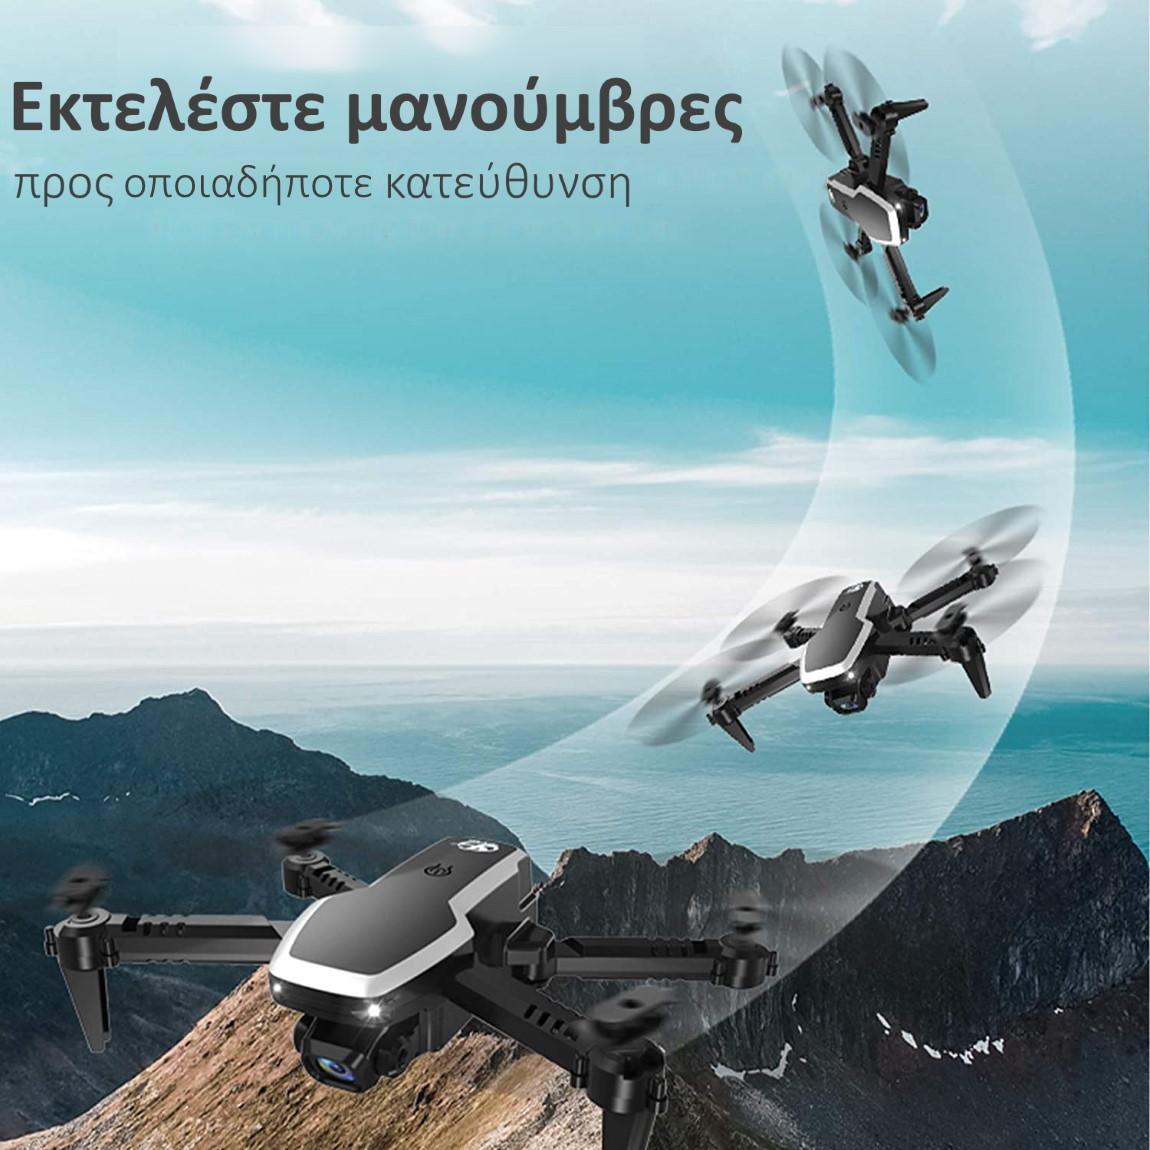 ToySky S171 Αναδιπλούμενο Mini Drone Quadcopter εκτέλεση περιστροφών